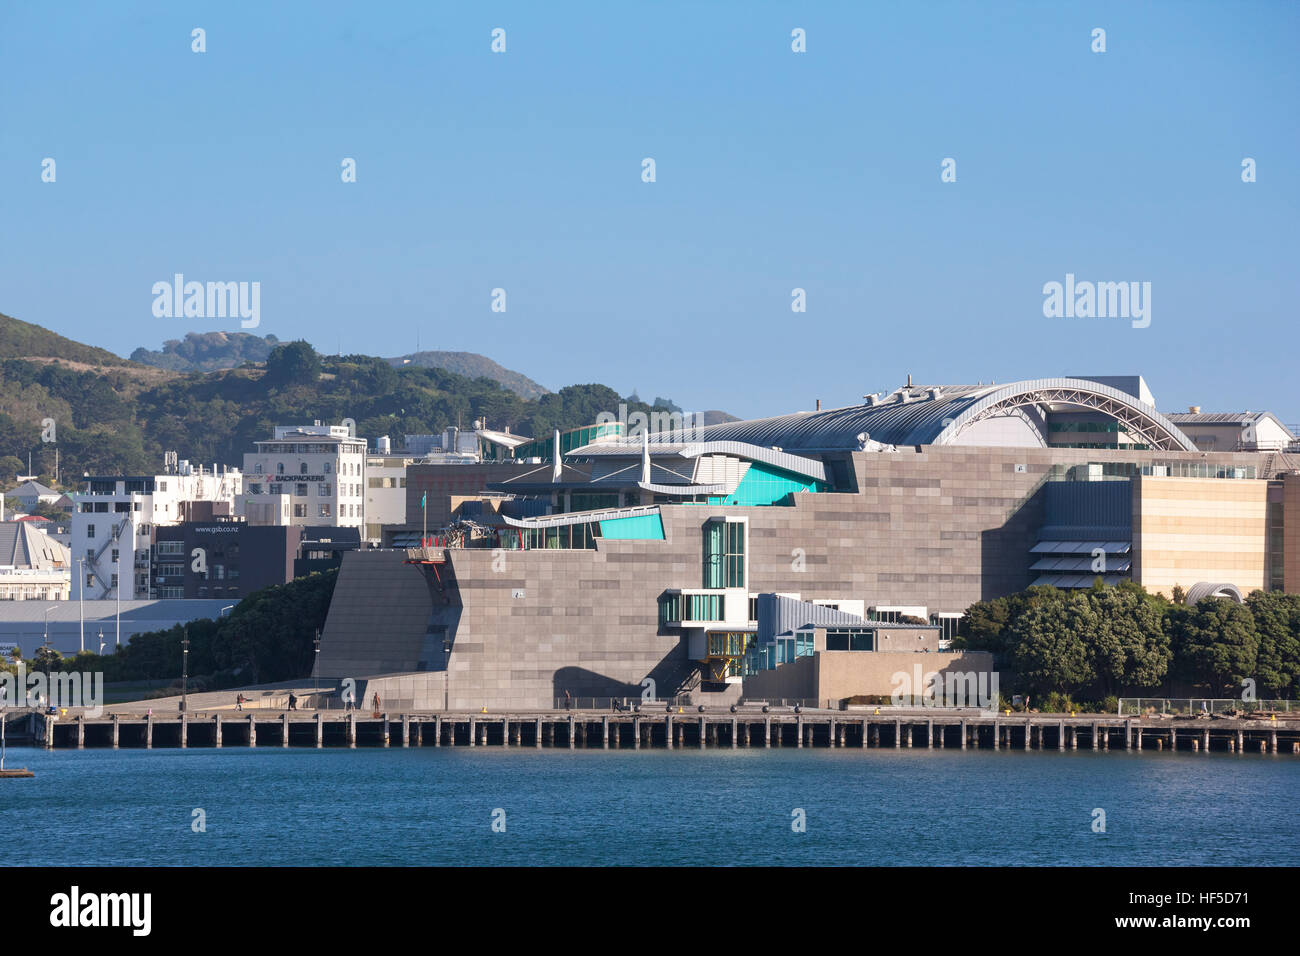 Wellington Waterfront Walk with Te Papa Tongarewa, Museum of New Zealand. View across Lambton Harbour. - Stock Image